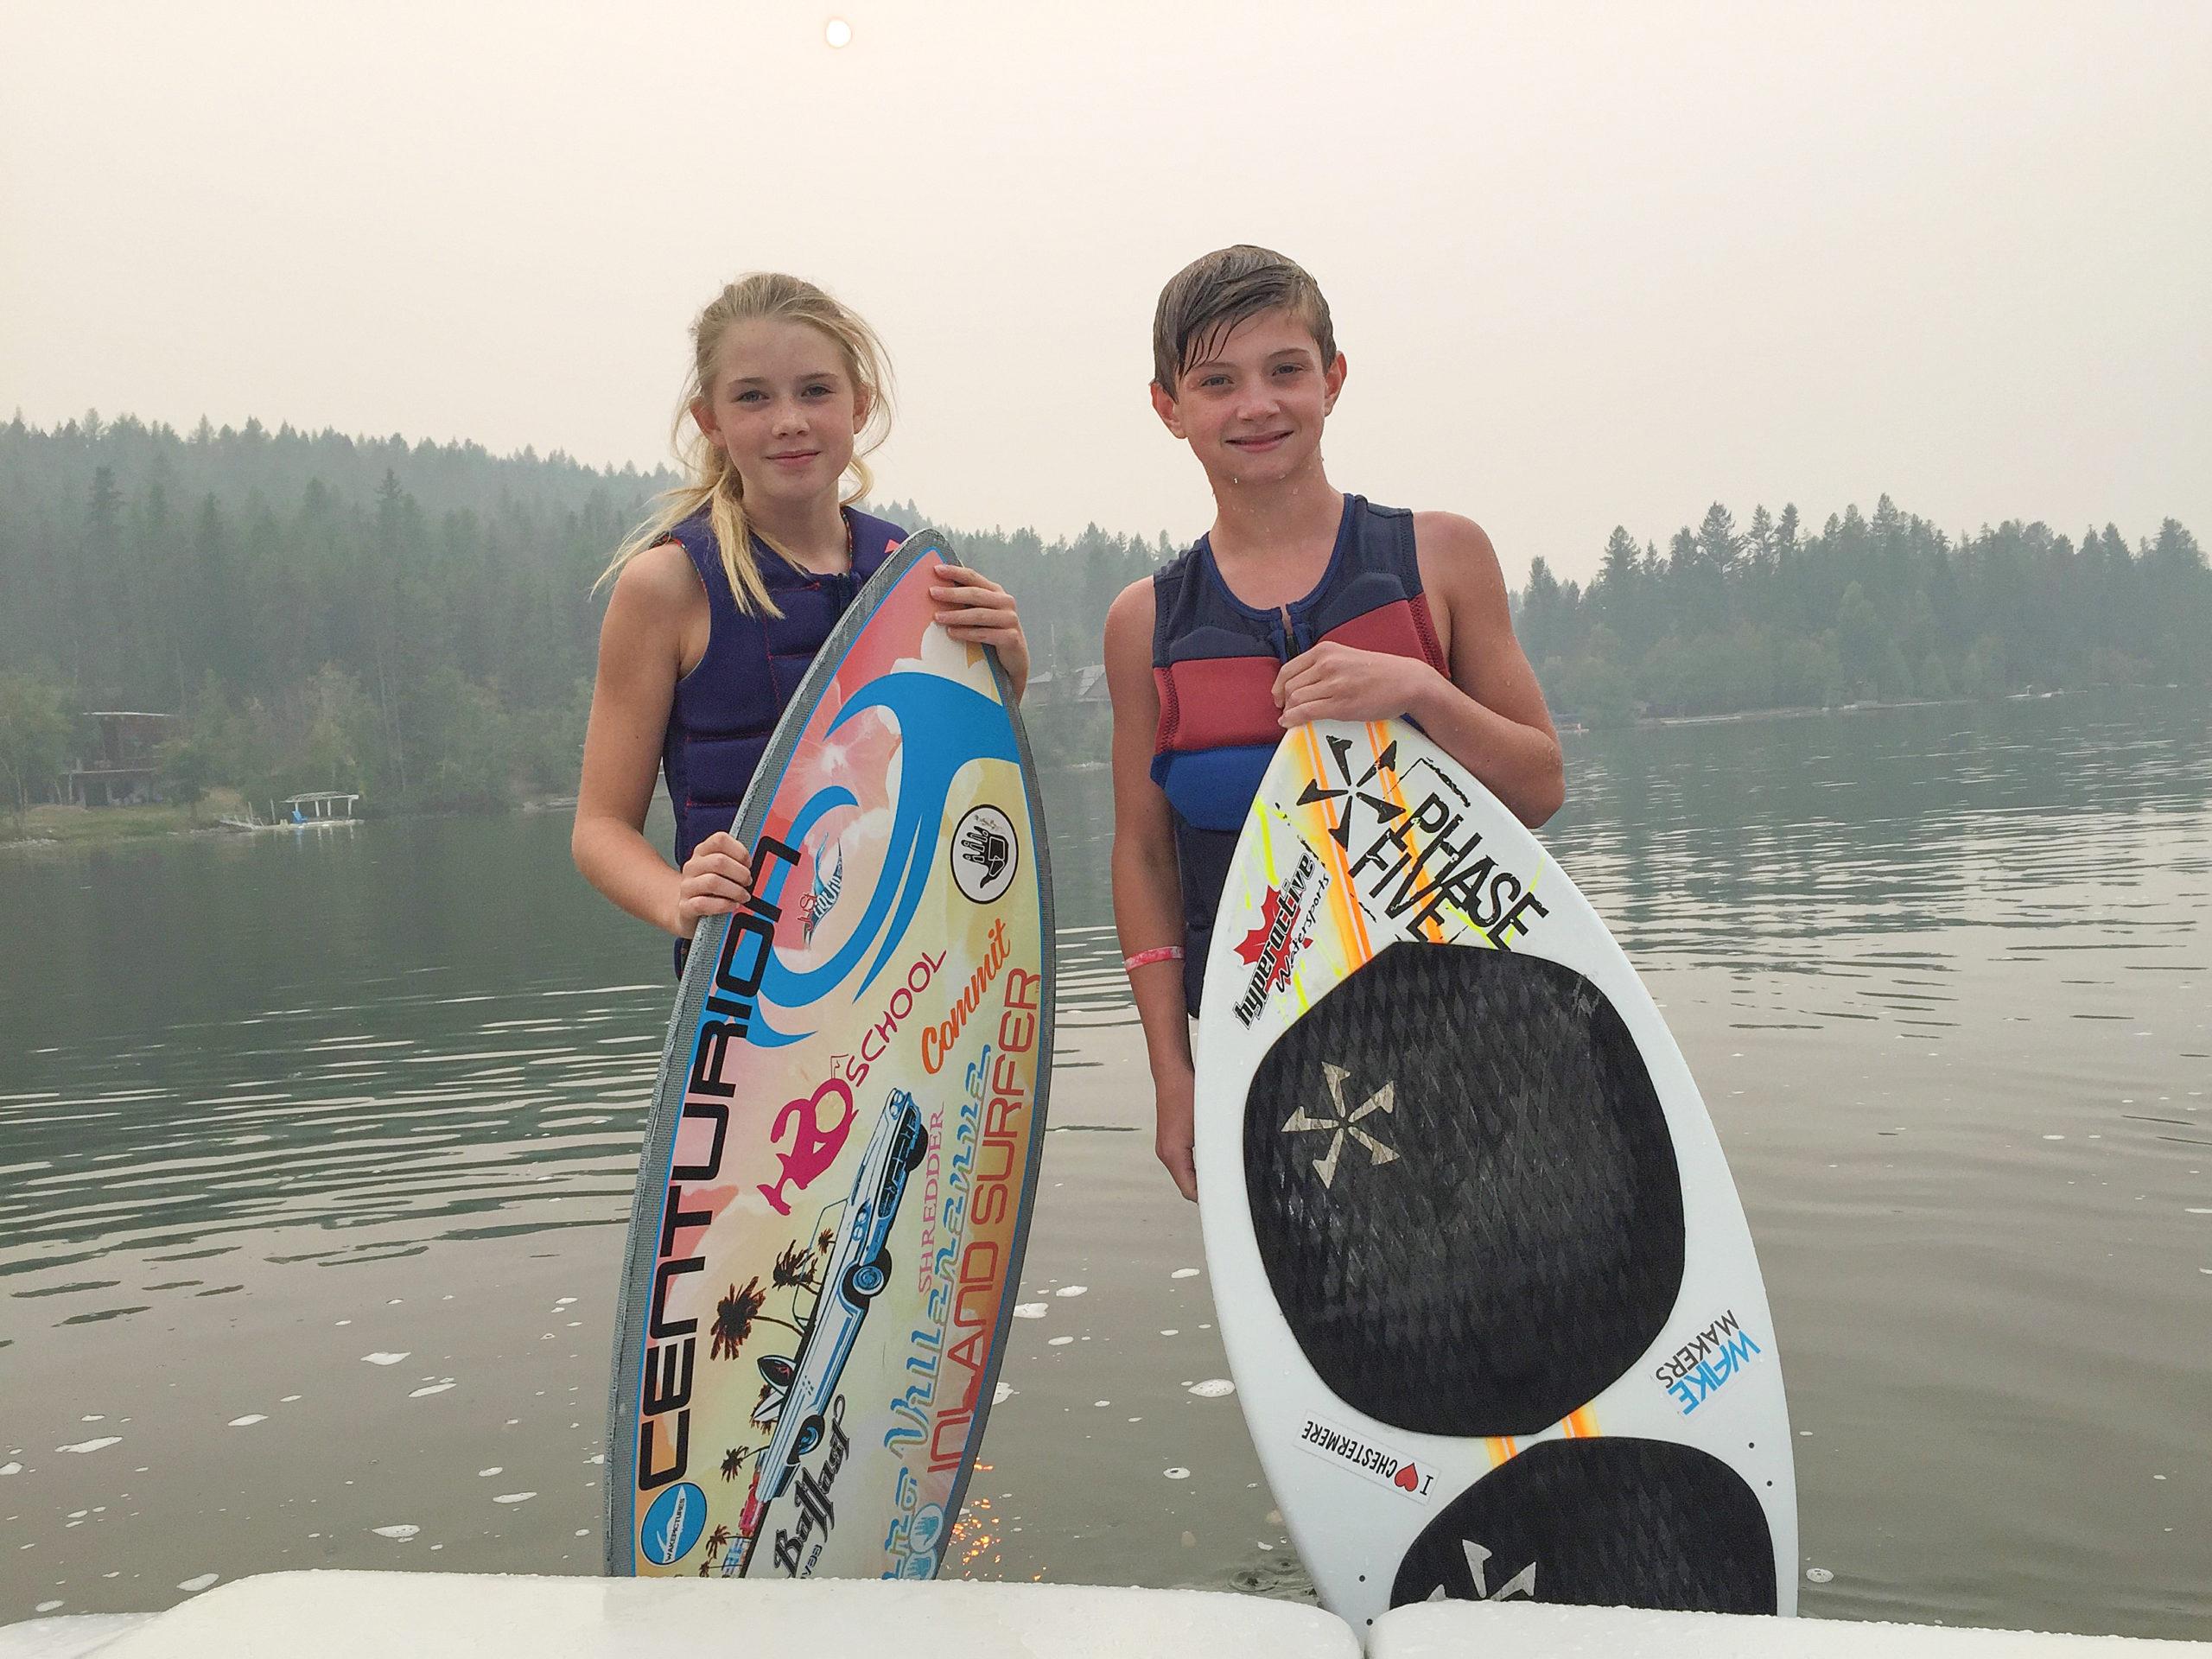 East Kootenay wake surfers competing at World Championships